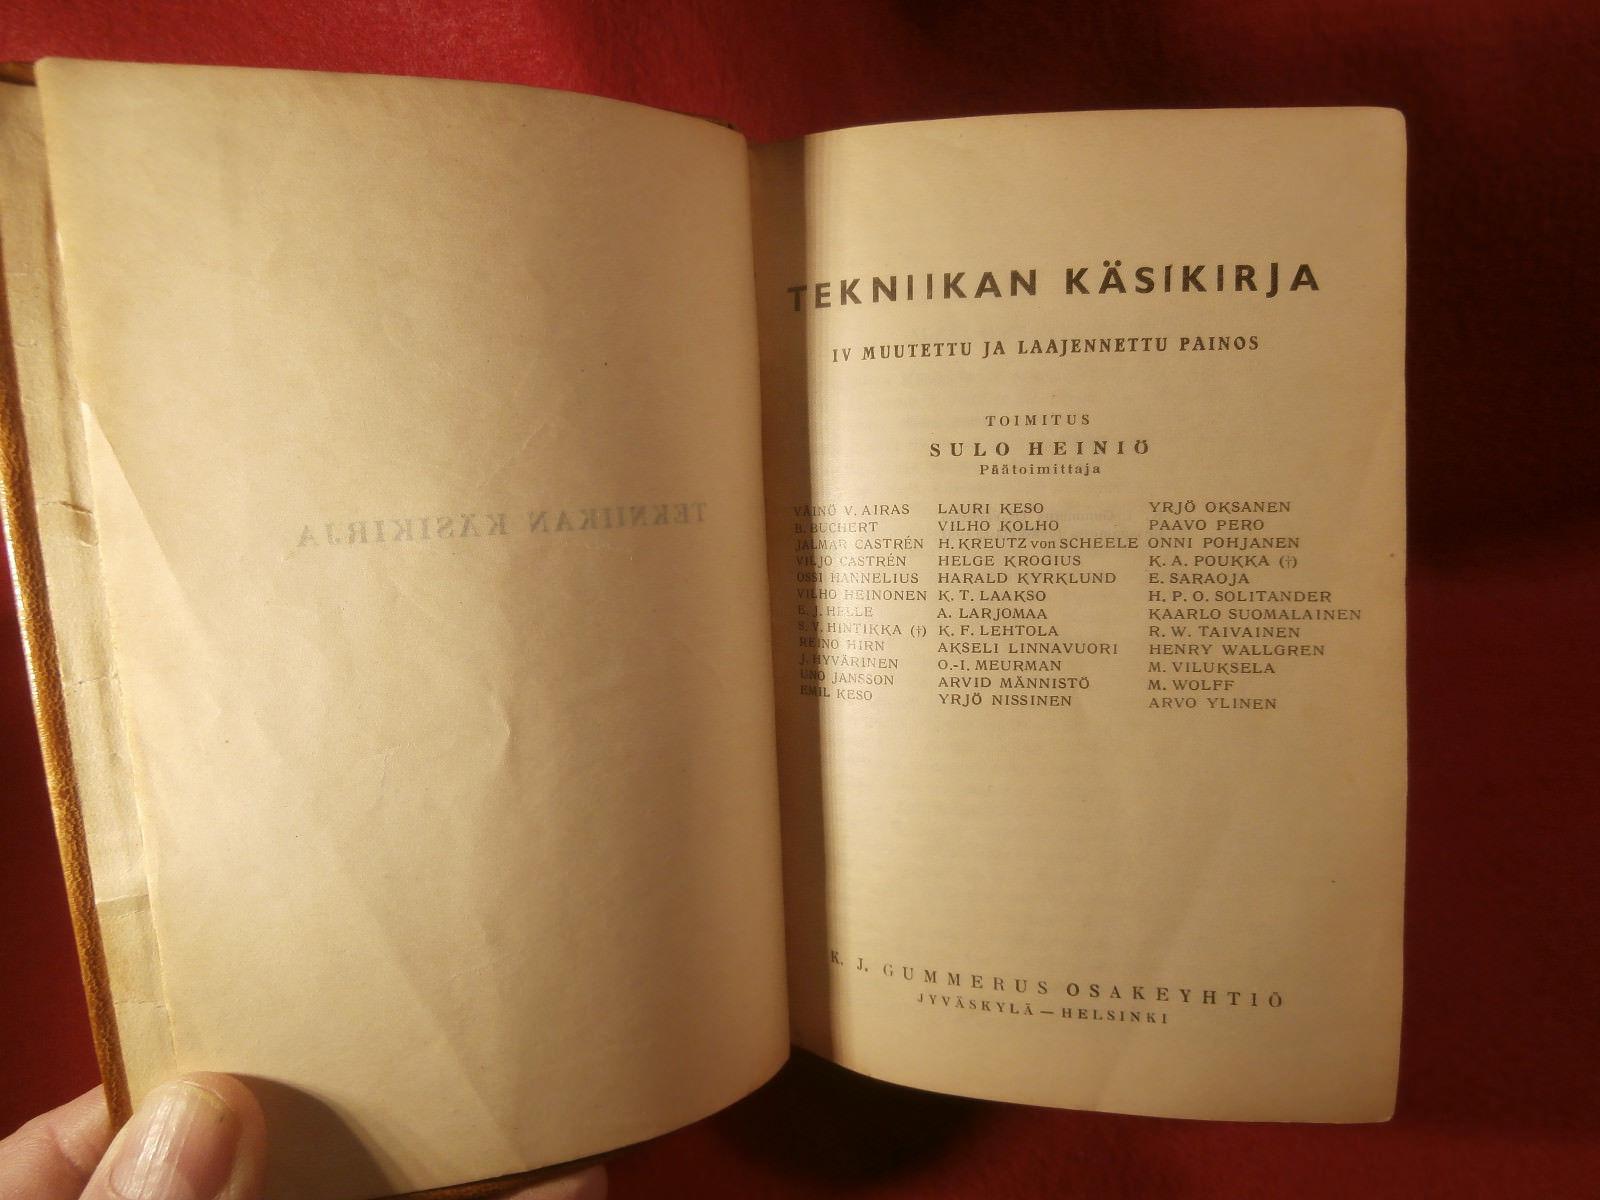 Tekniikan Kasikirja by K J Gummerus Soft Leather Bound 1st Edition